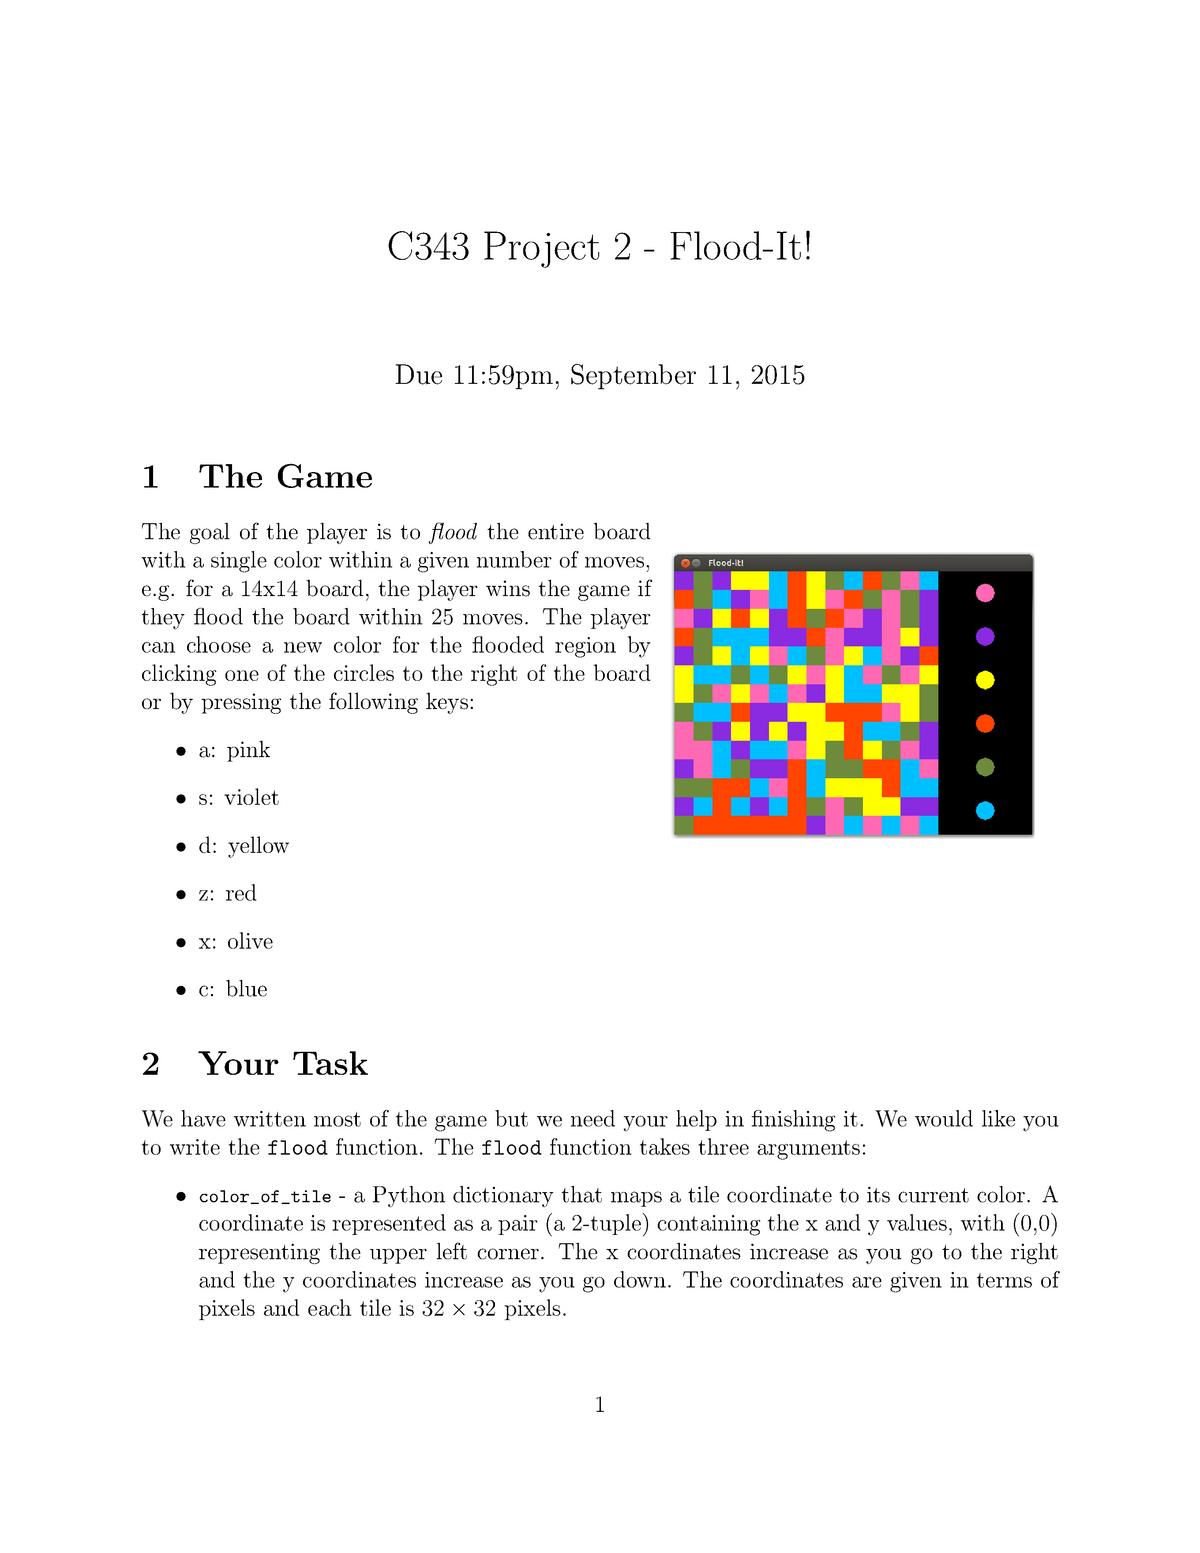 Seminar assignments - Project 2- flood-it! - CSCI-C 343